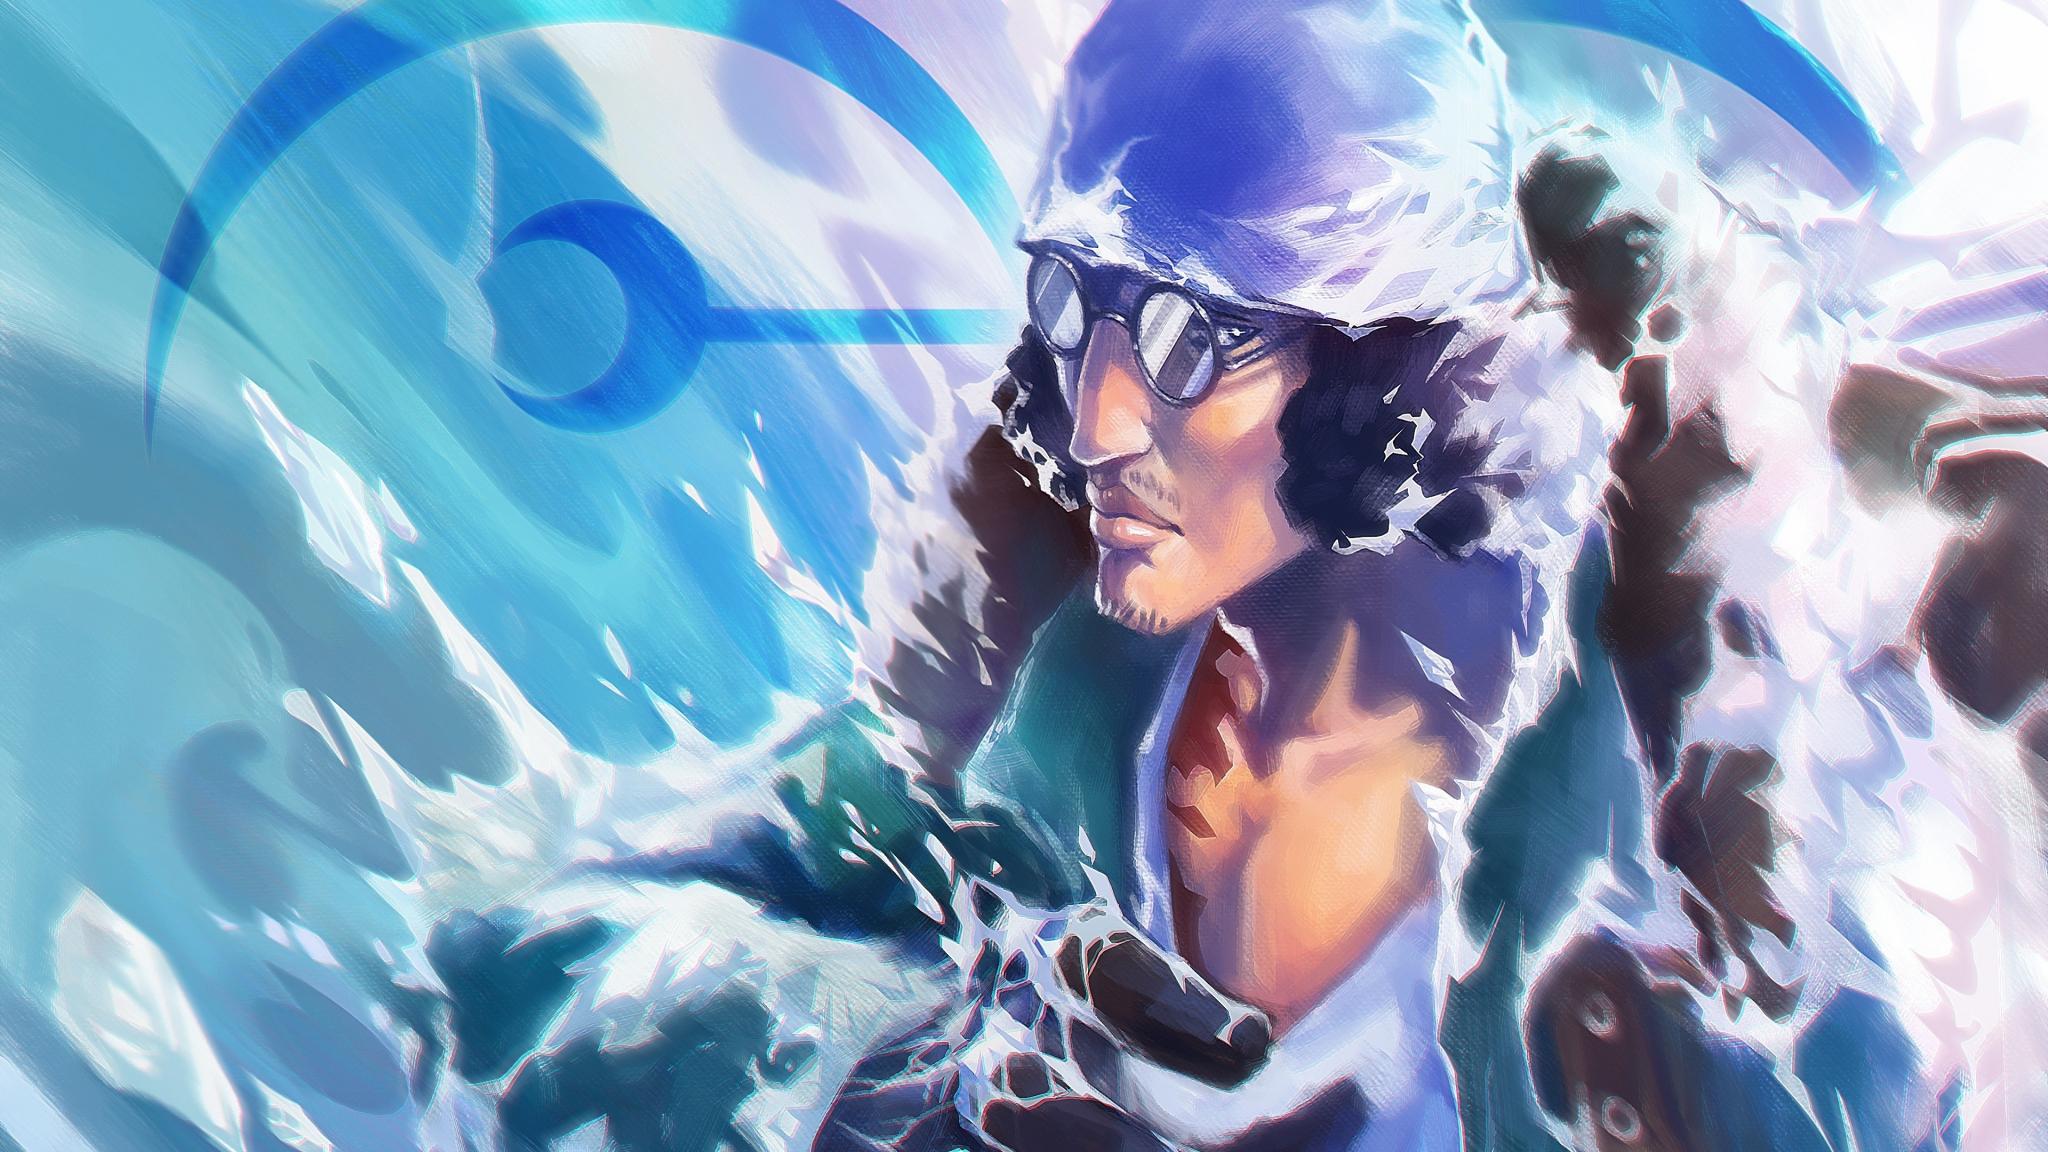 Download 2048x1152 Wallpaper Kuzan One Piece Anime Dual